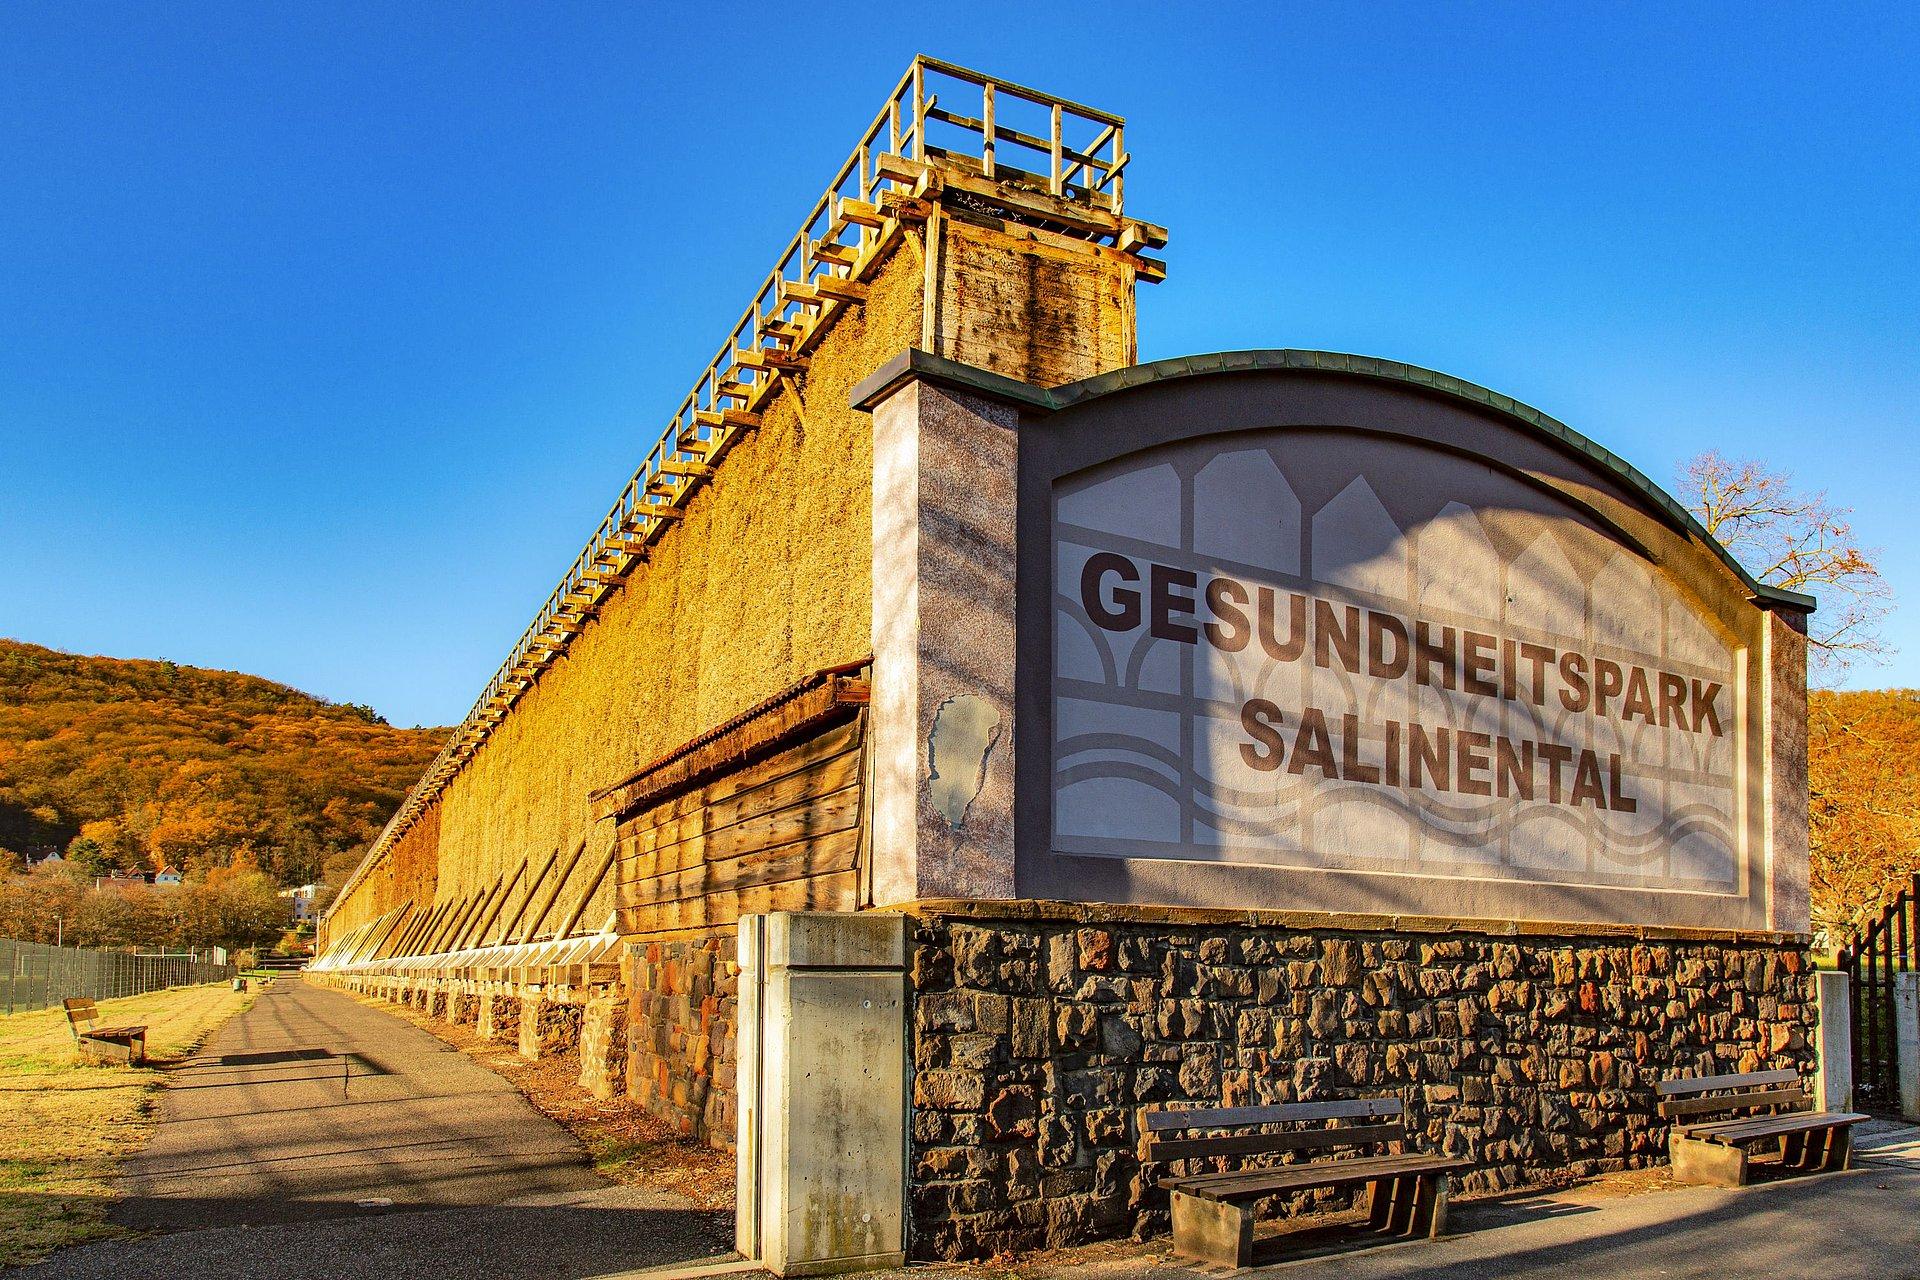 Gradeerwerk in het Gezondheidspark Salinendal Bad Kreuznach, Nahe-regio